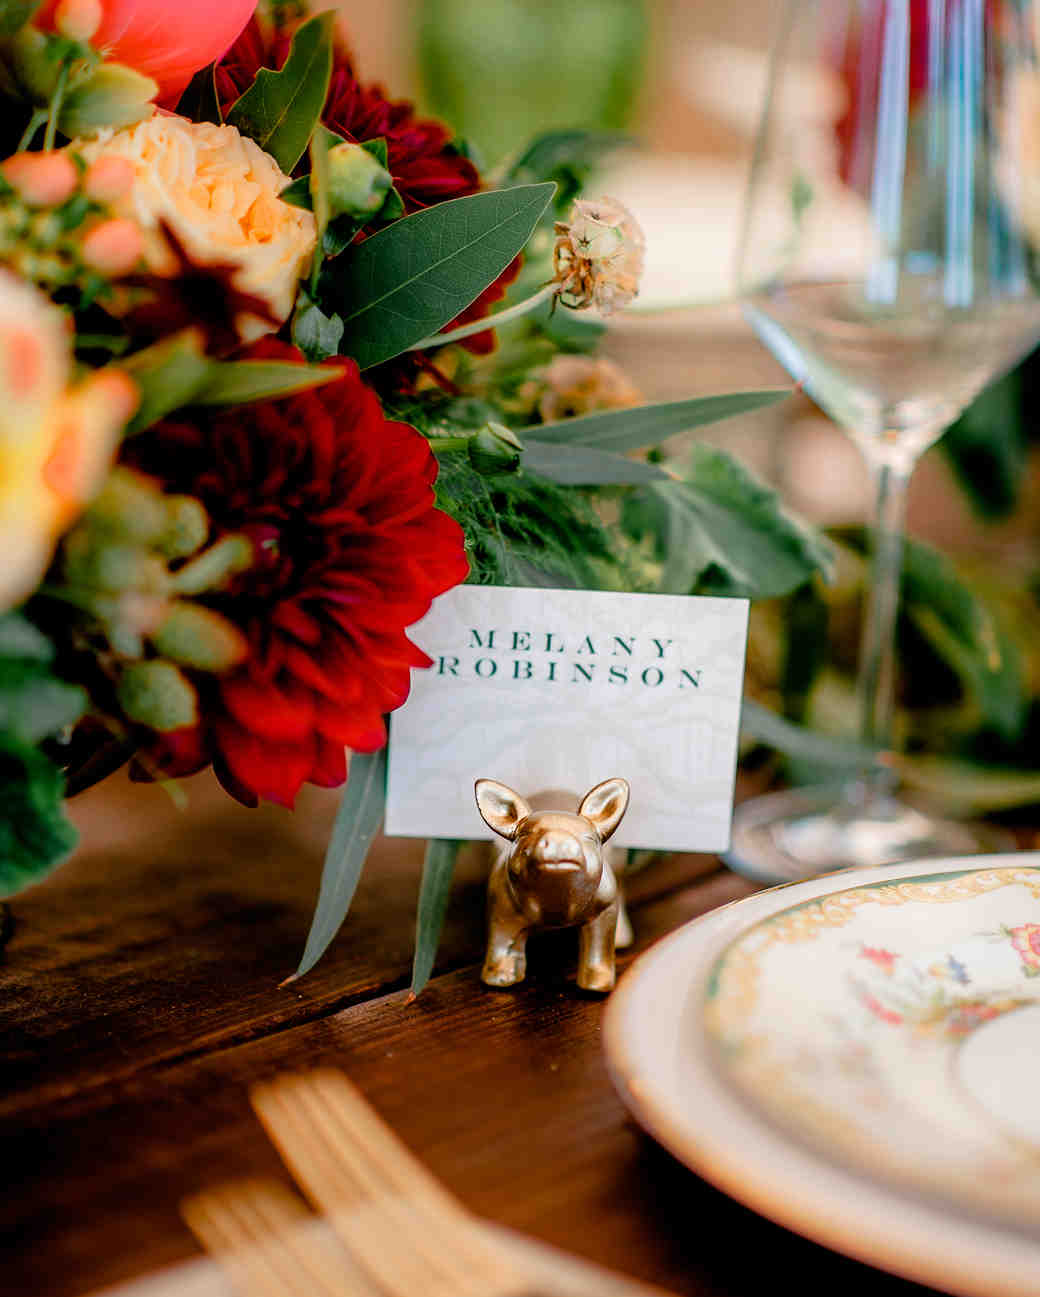 melany-drew-wedding-placecard-111-s112184-0915.jpg